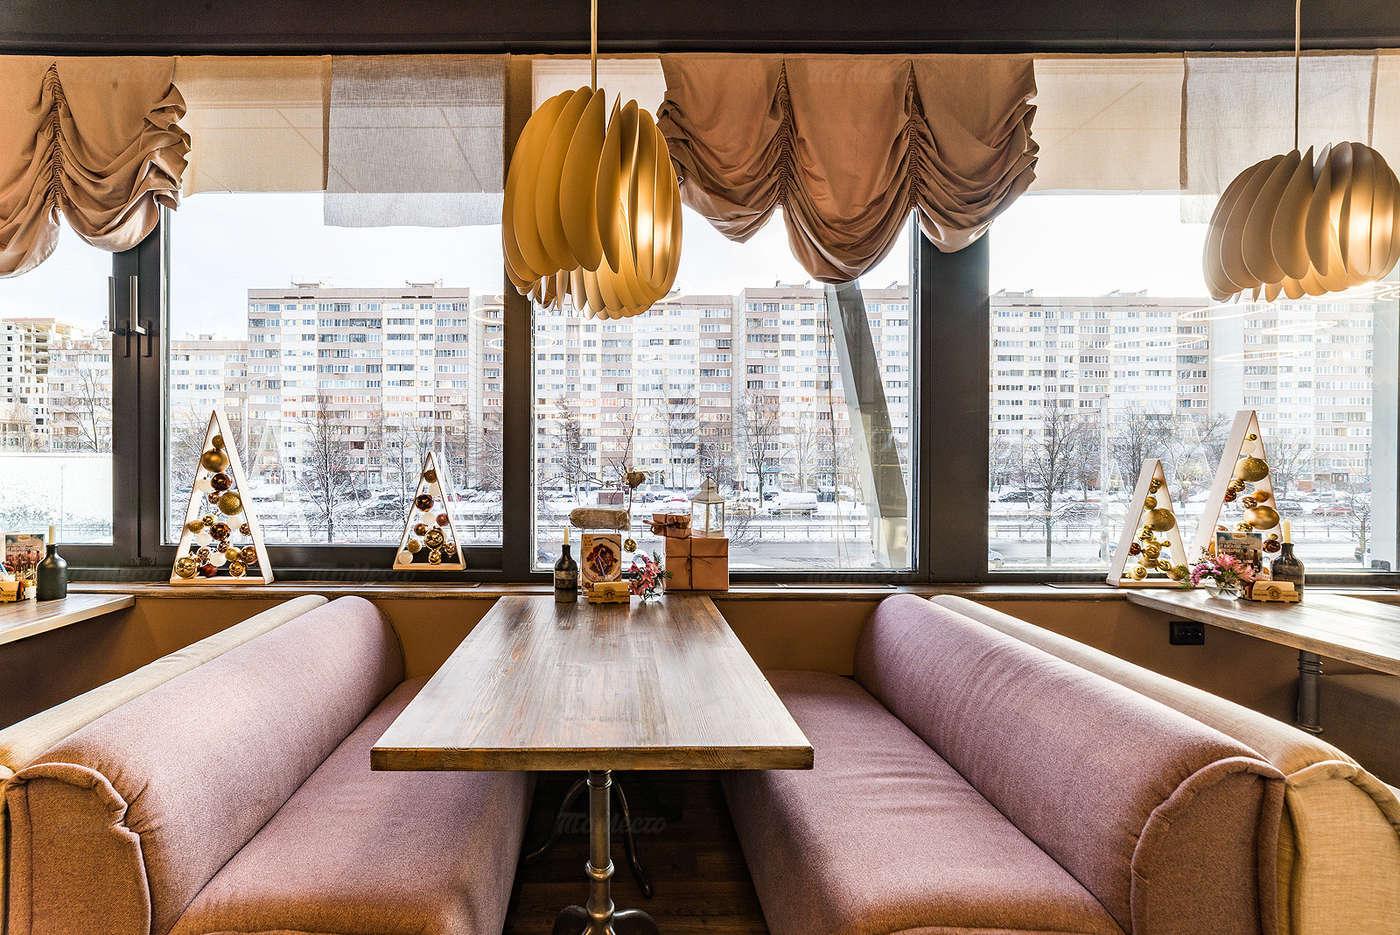 Ресторан Шато Винтаж (Chateau Vintage) на проспекте Энгельса фото 10